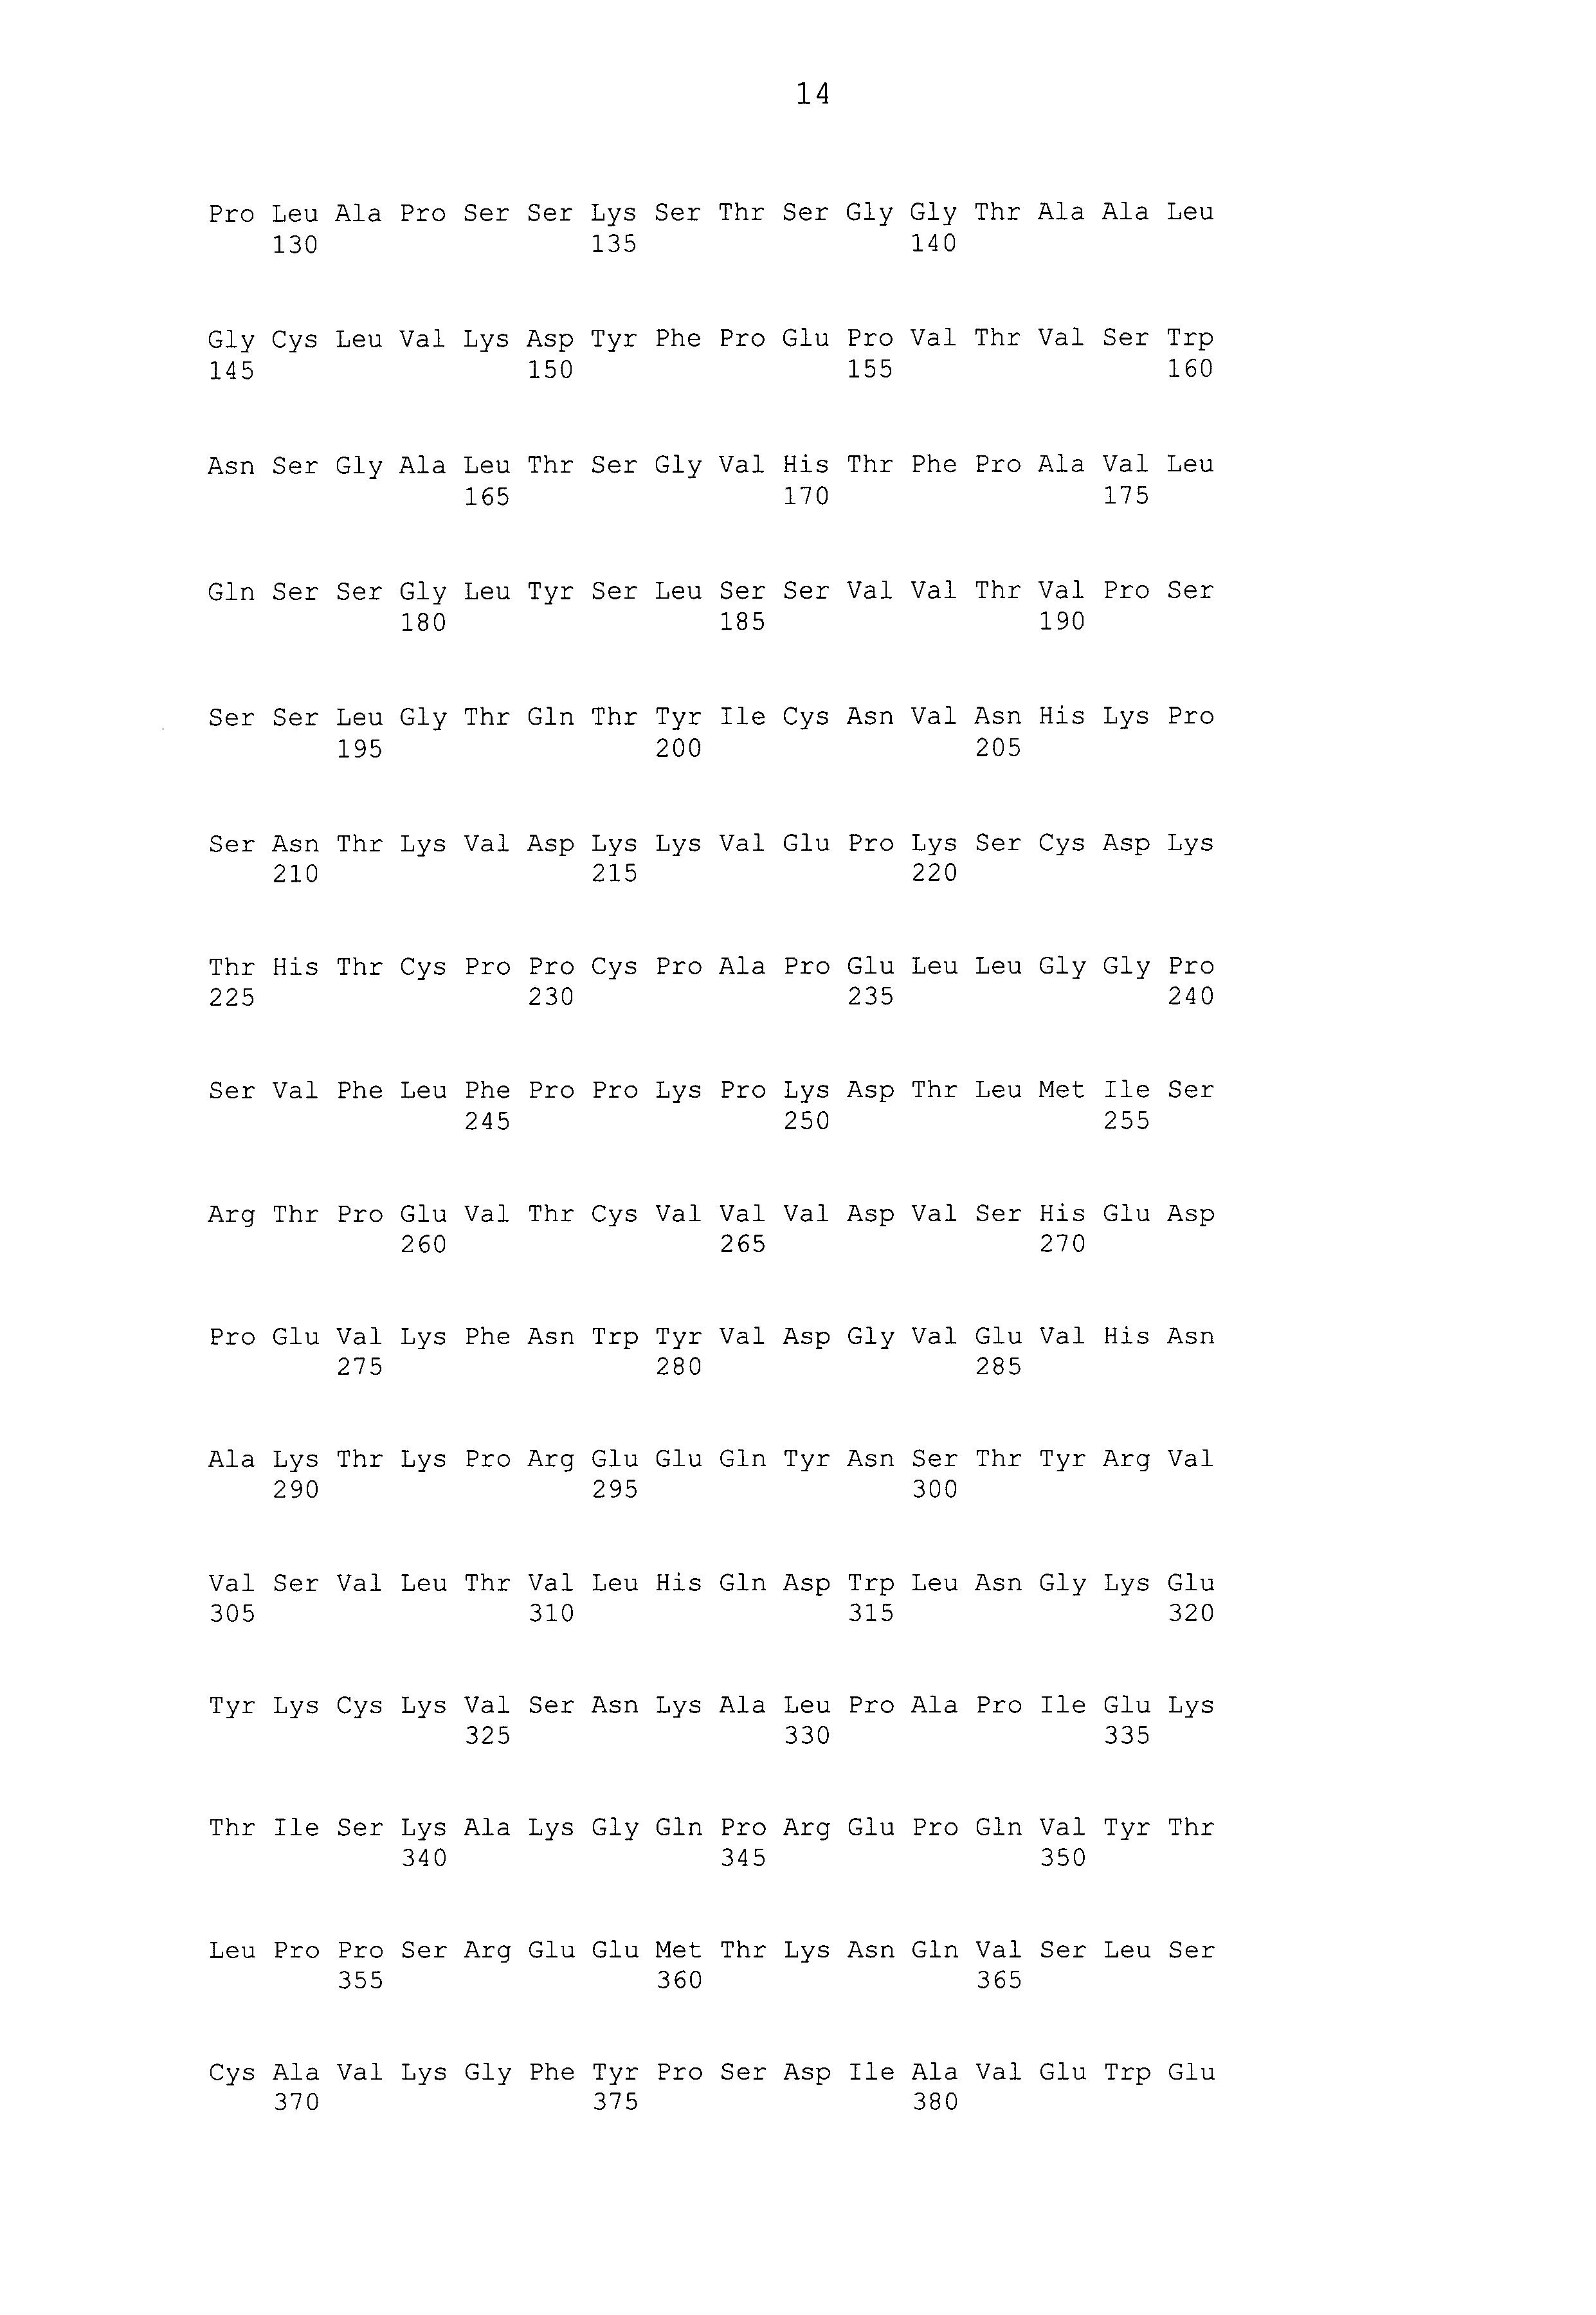 34b876c91f1fbfb0a1ea537bce8b5071